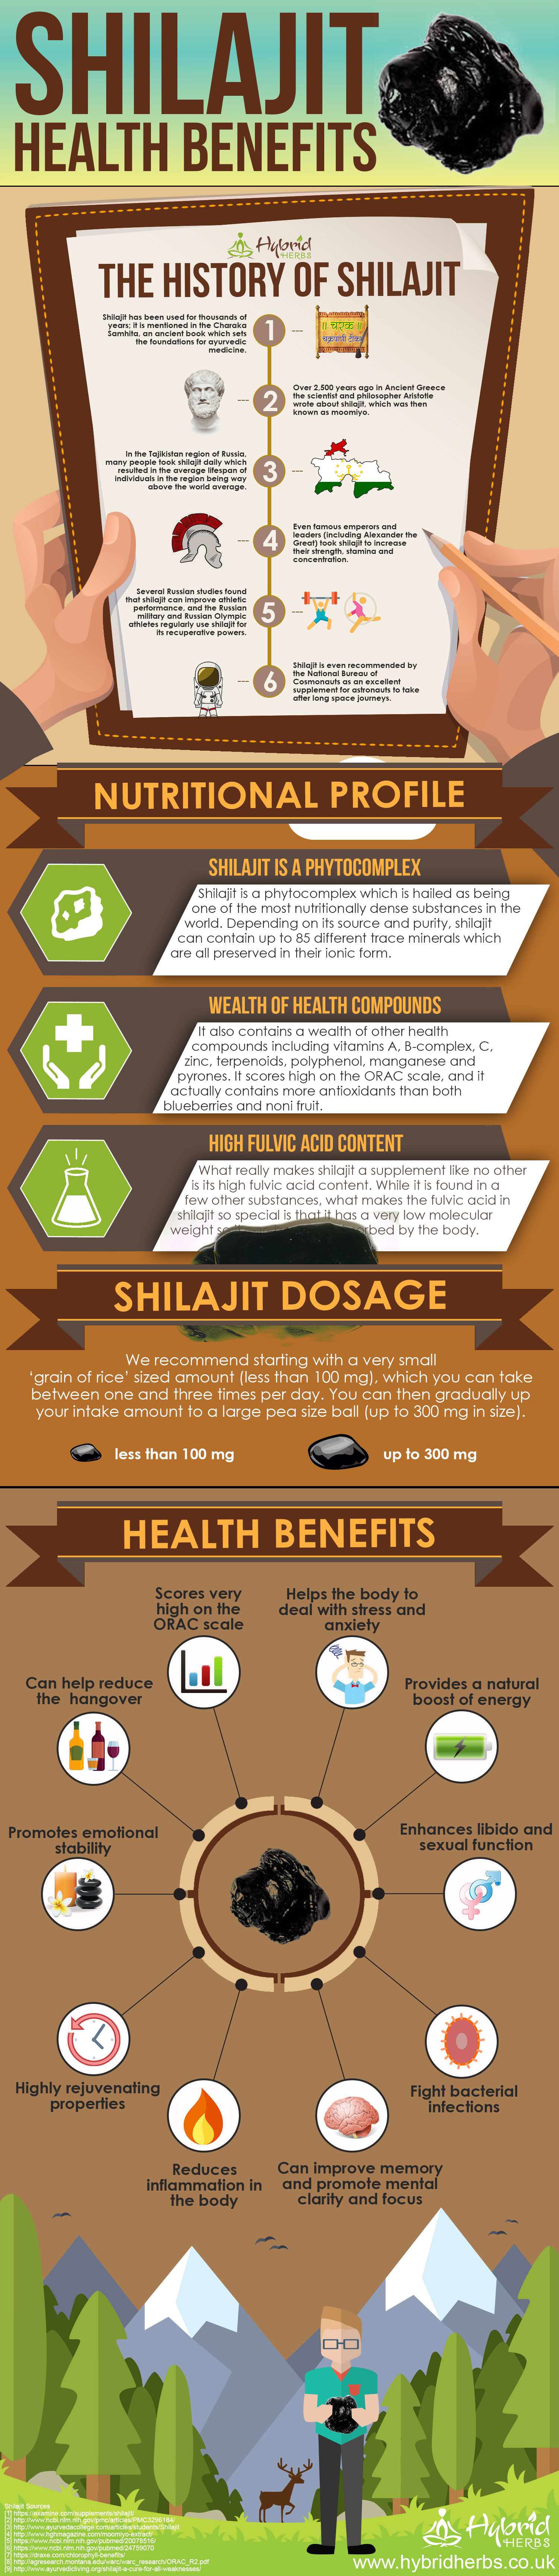 shilajit-health-benefits.jpg